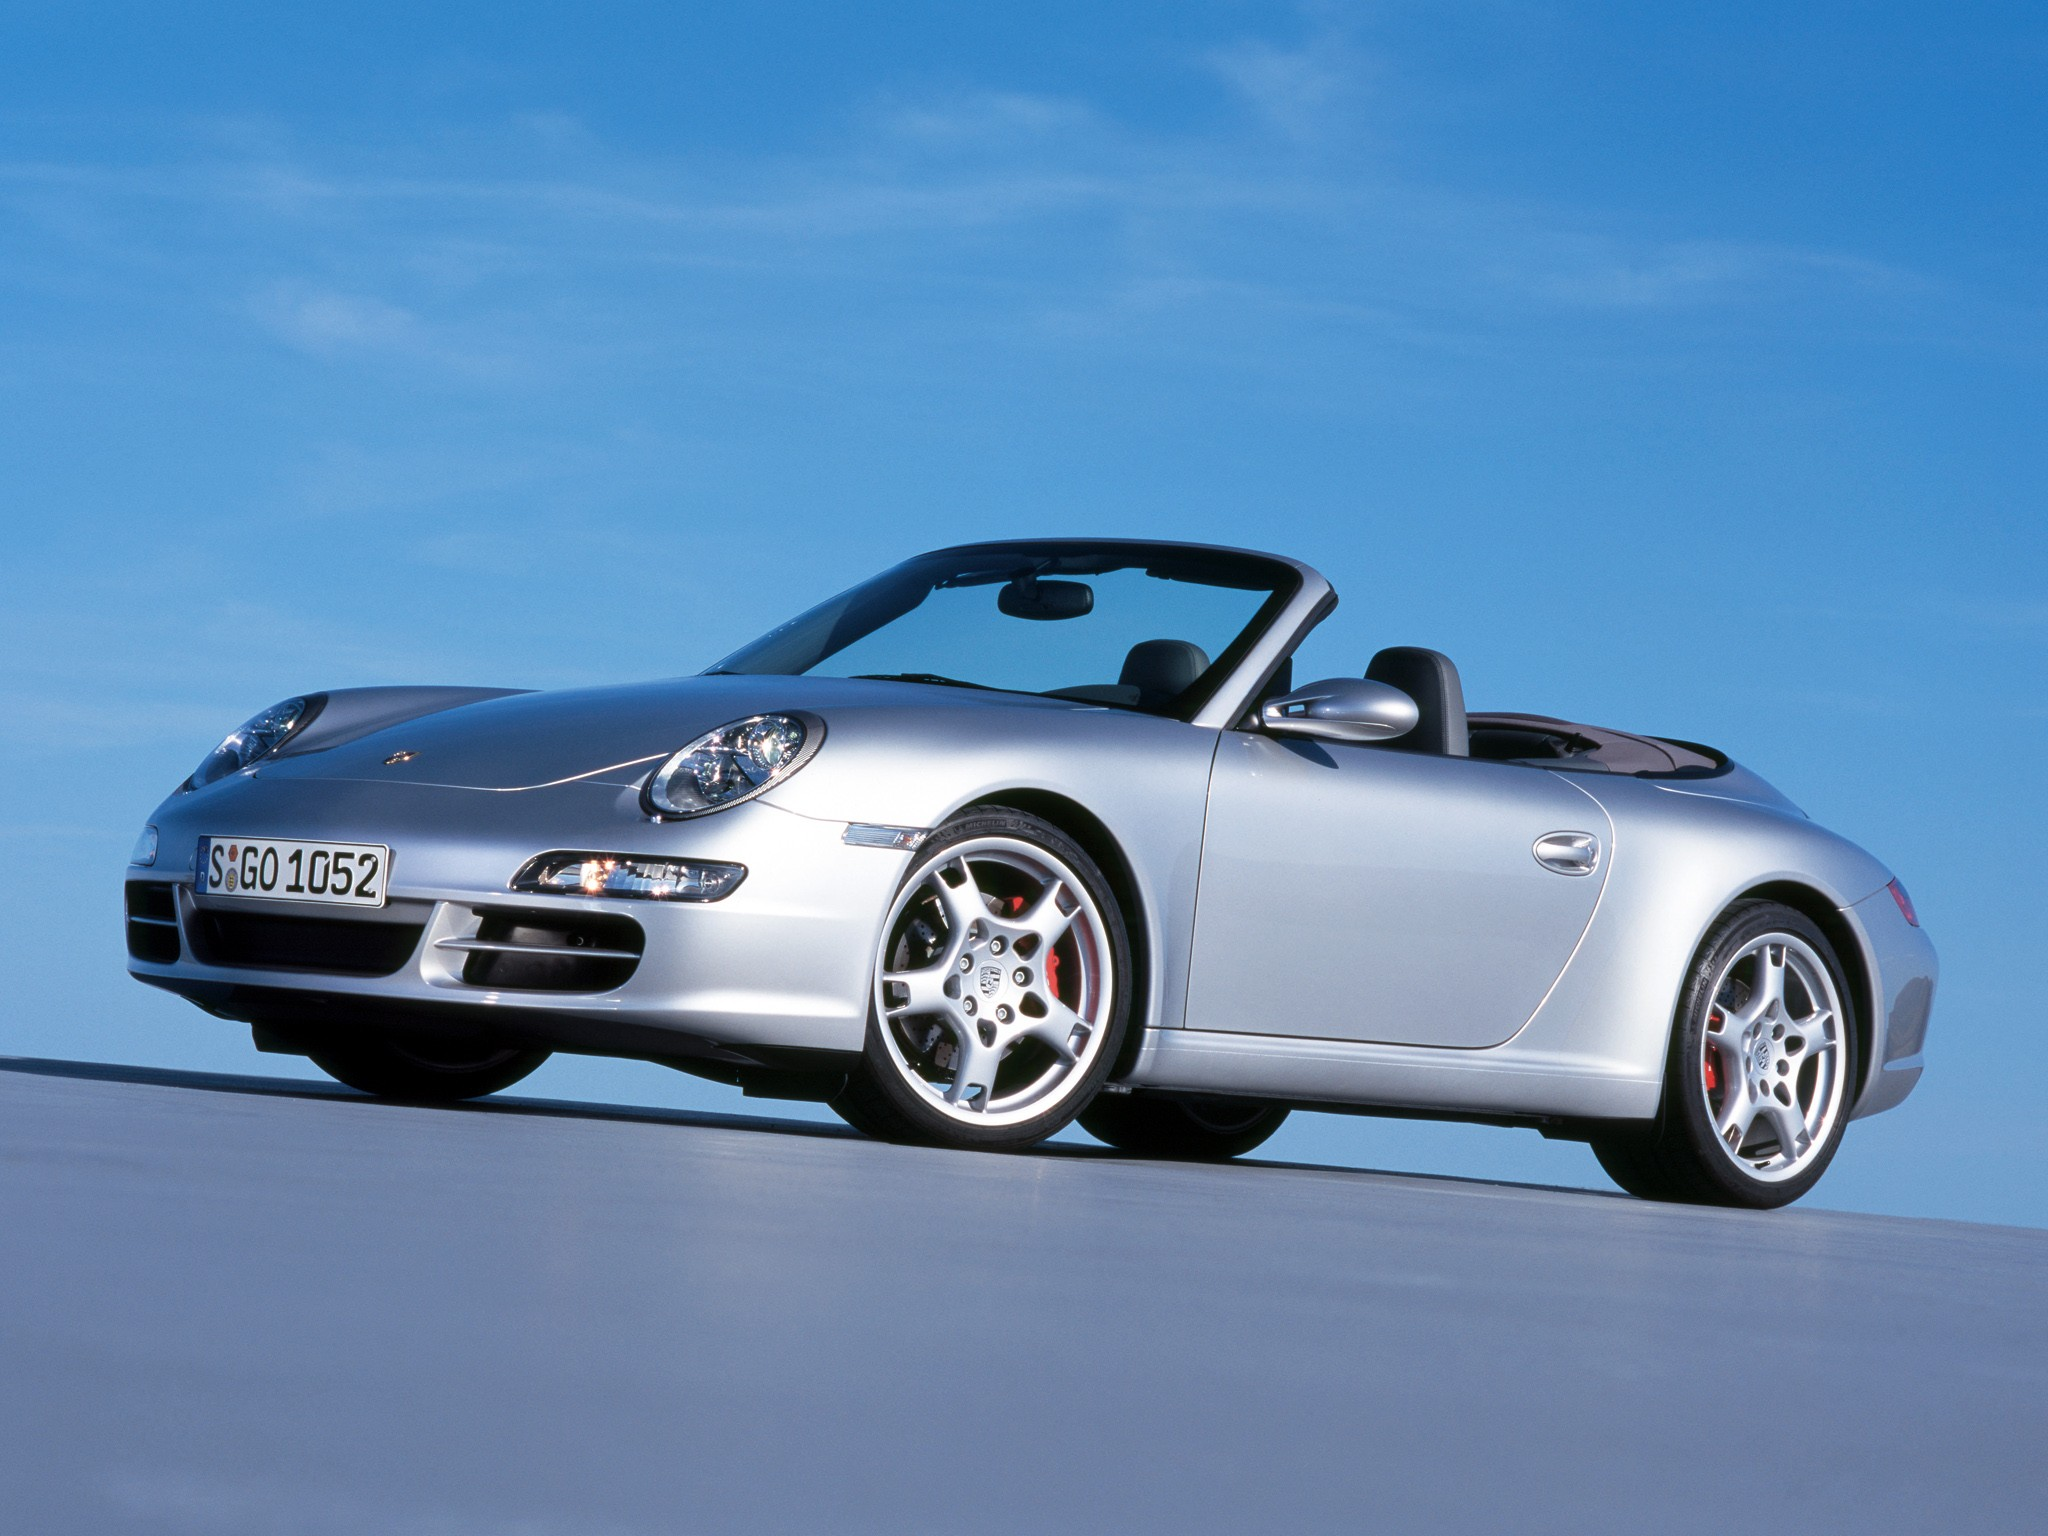 Porsche 911 Carrera S Cabriolet 997 Specs Amp Photos